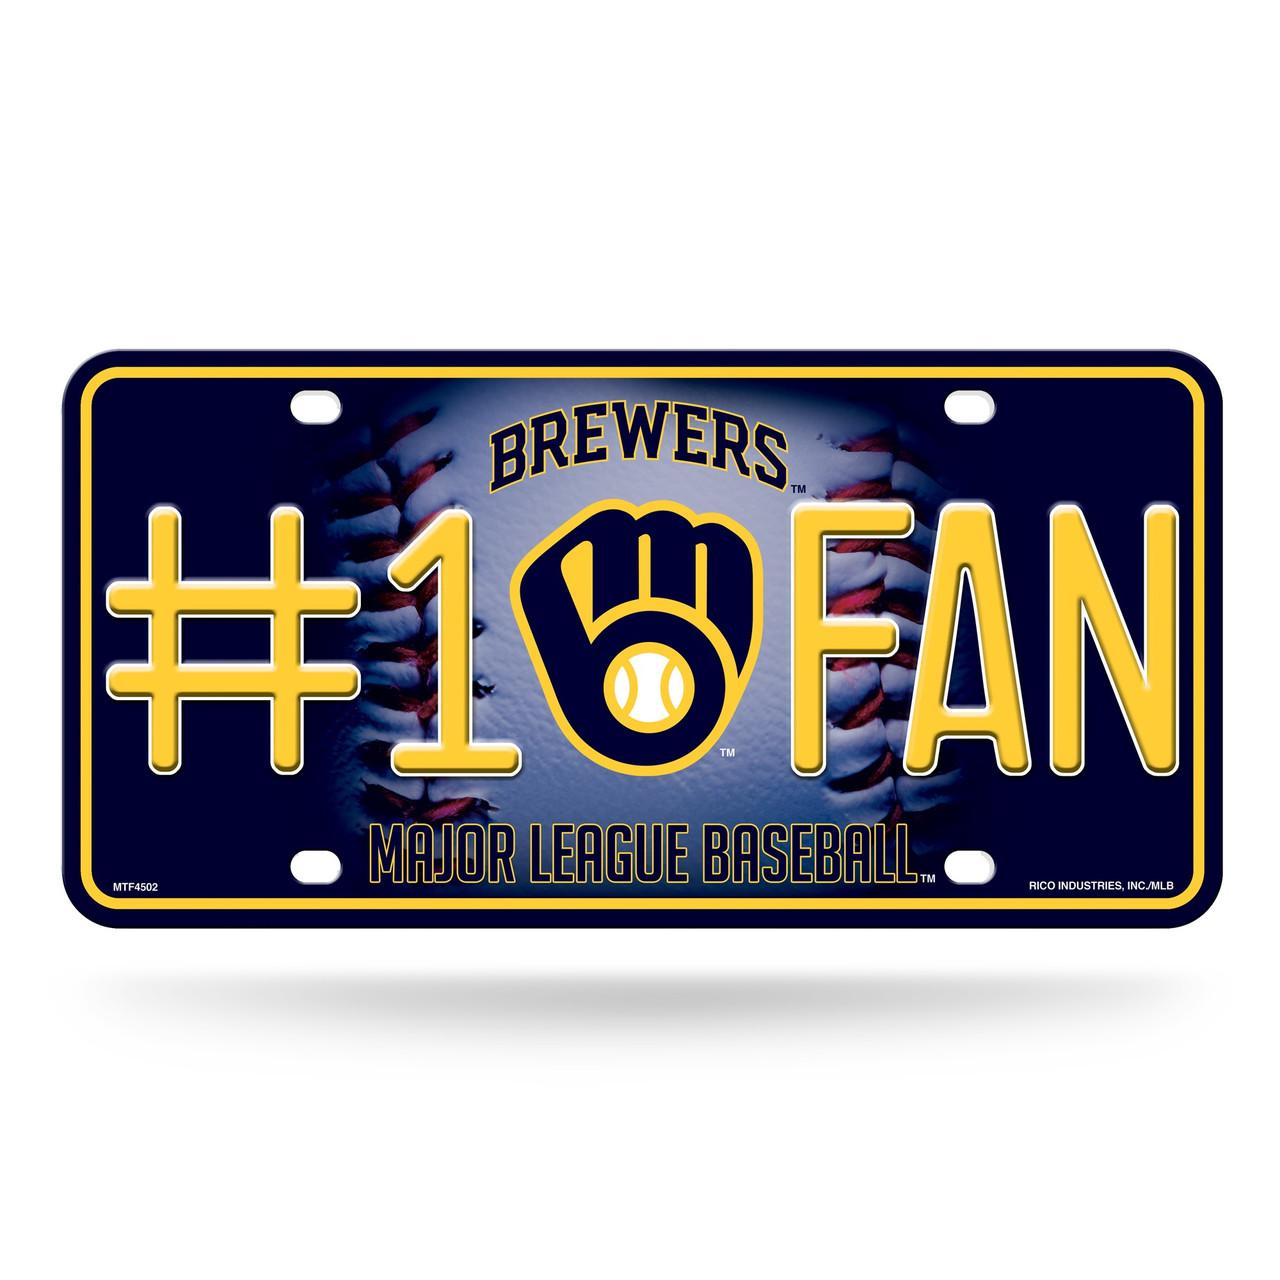 Milwaukee Brewers License Plate #1 Fan Alternate Design